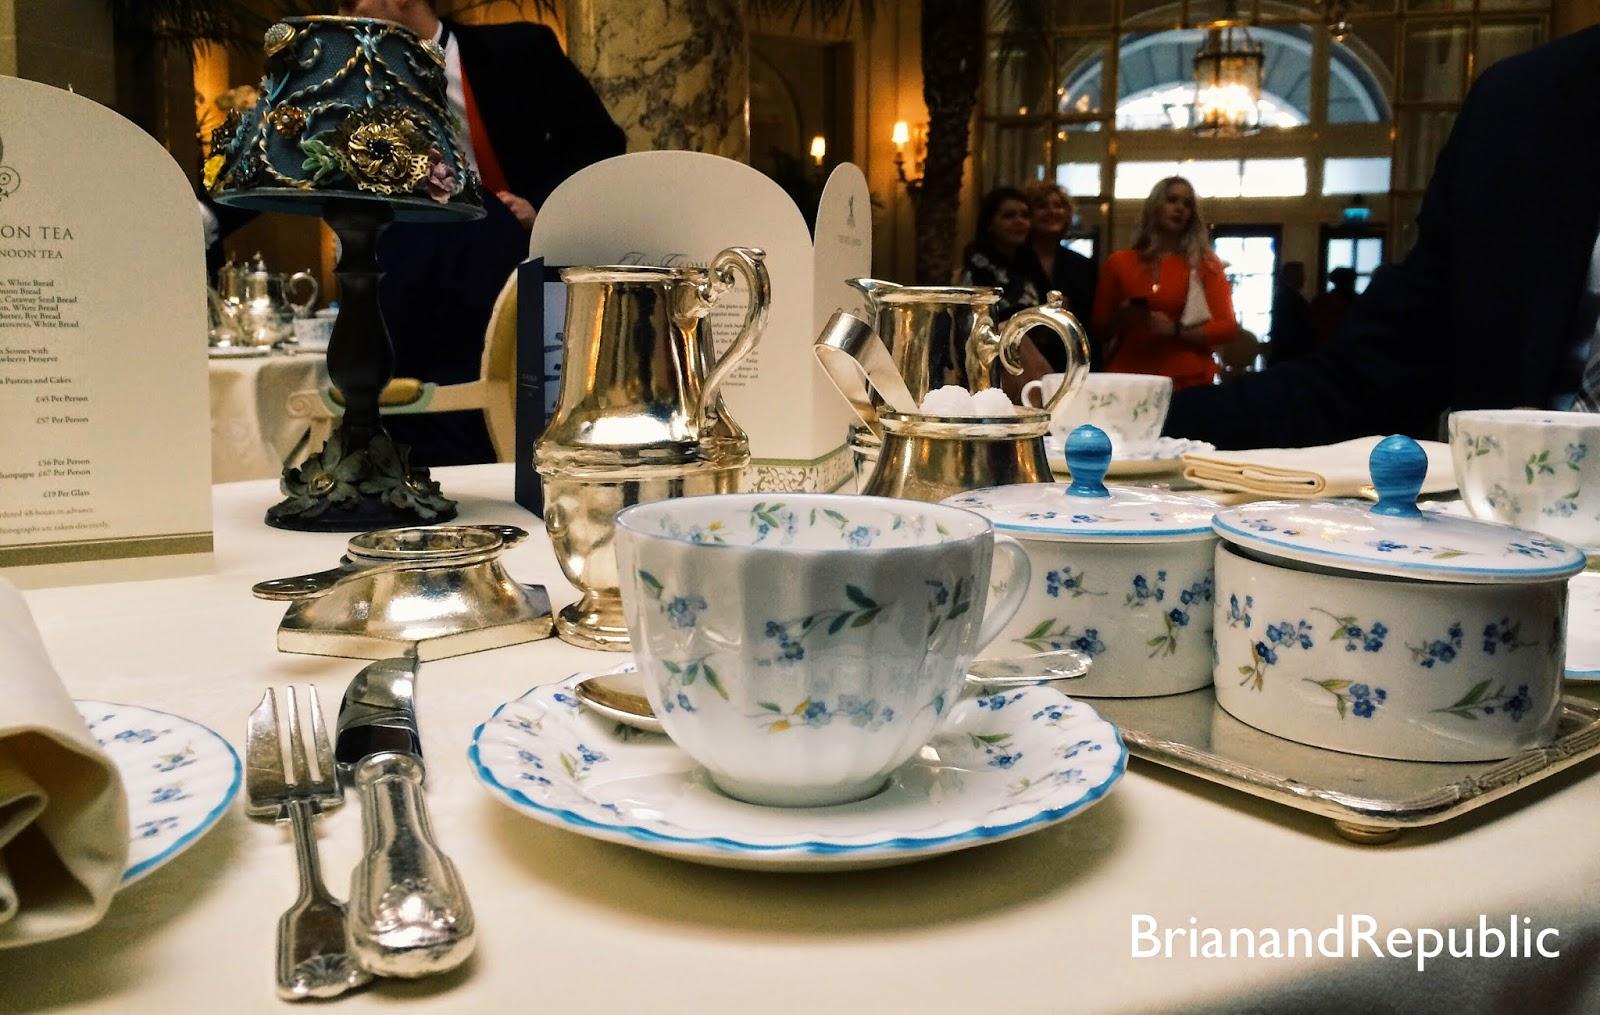 Tea at the ritz dress code